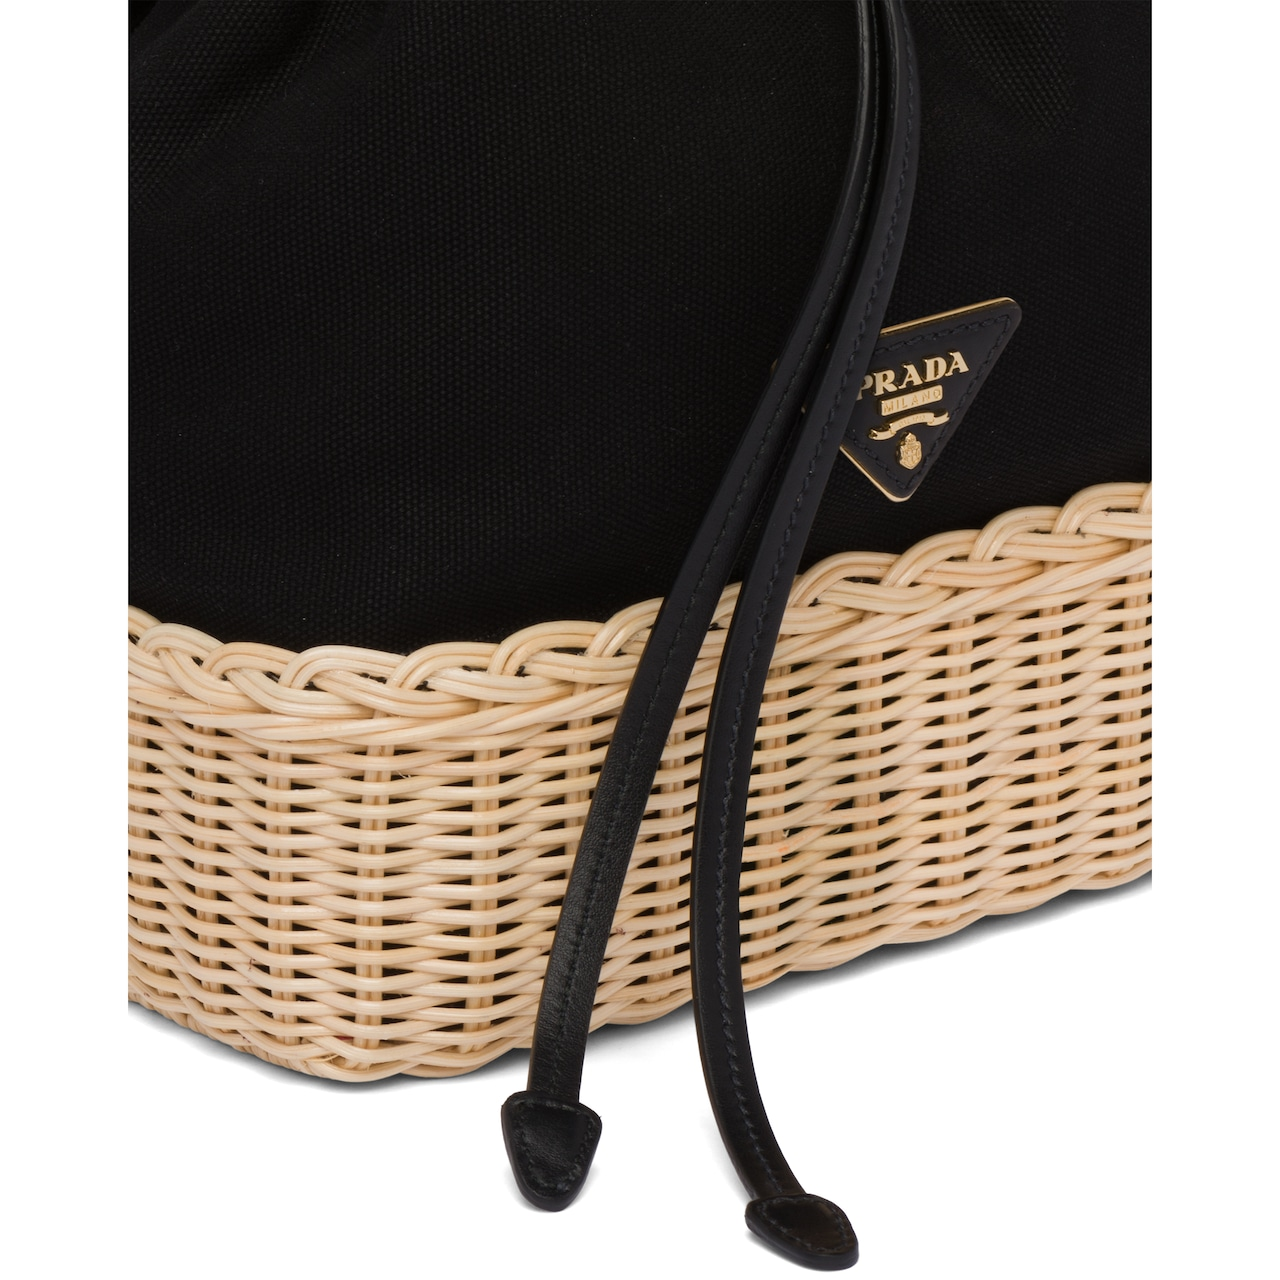 Prada Prada Plage 柳条和帆布水桶包 6